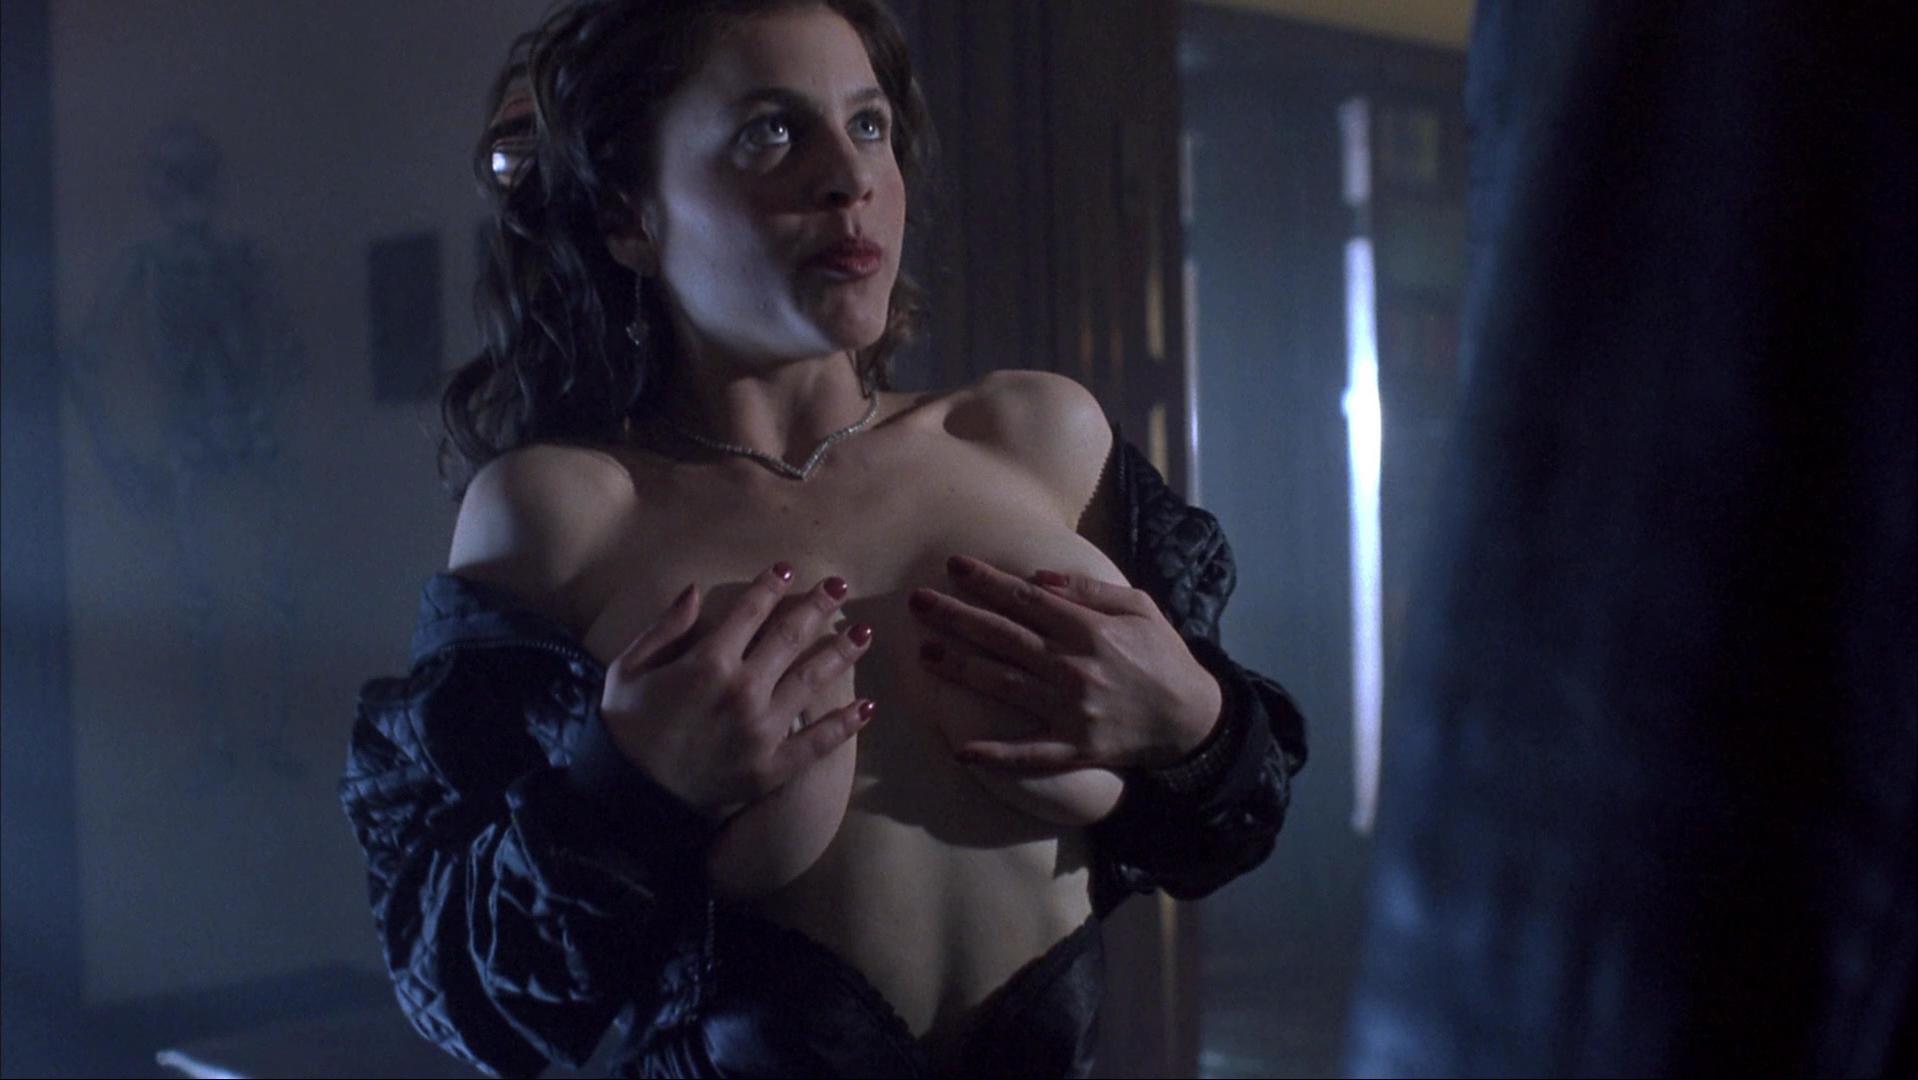 Christi harris naked